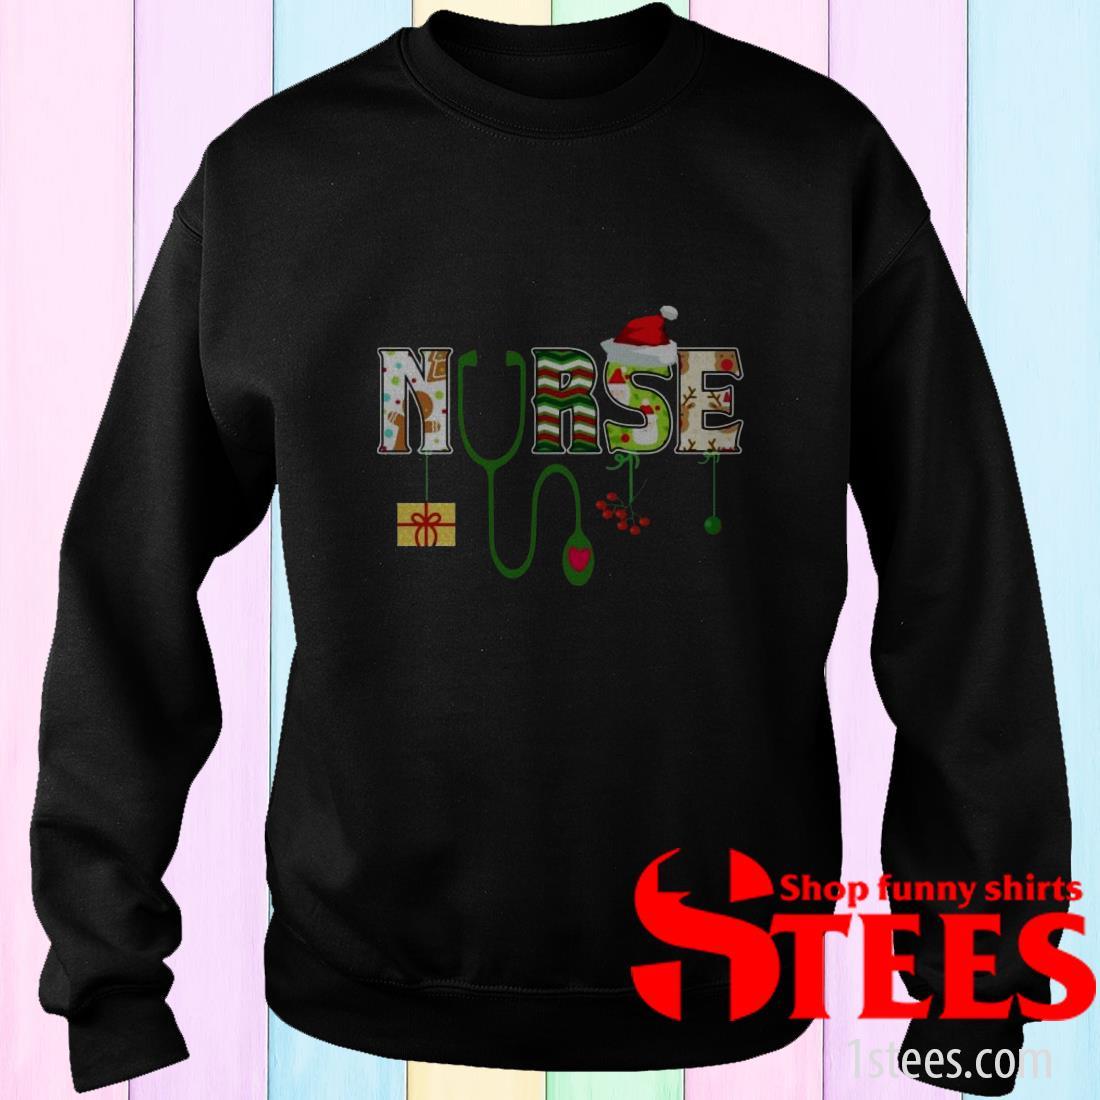 Nurse Christmas Sweatshirt